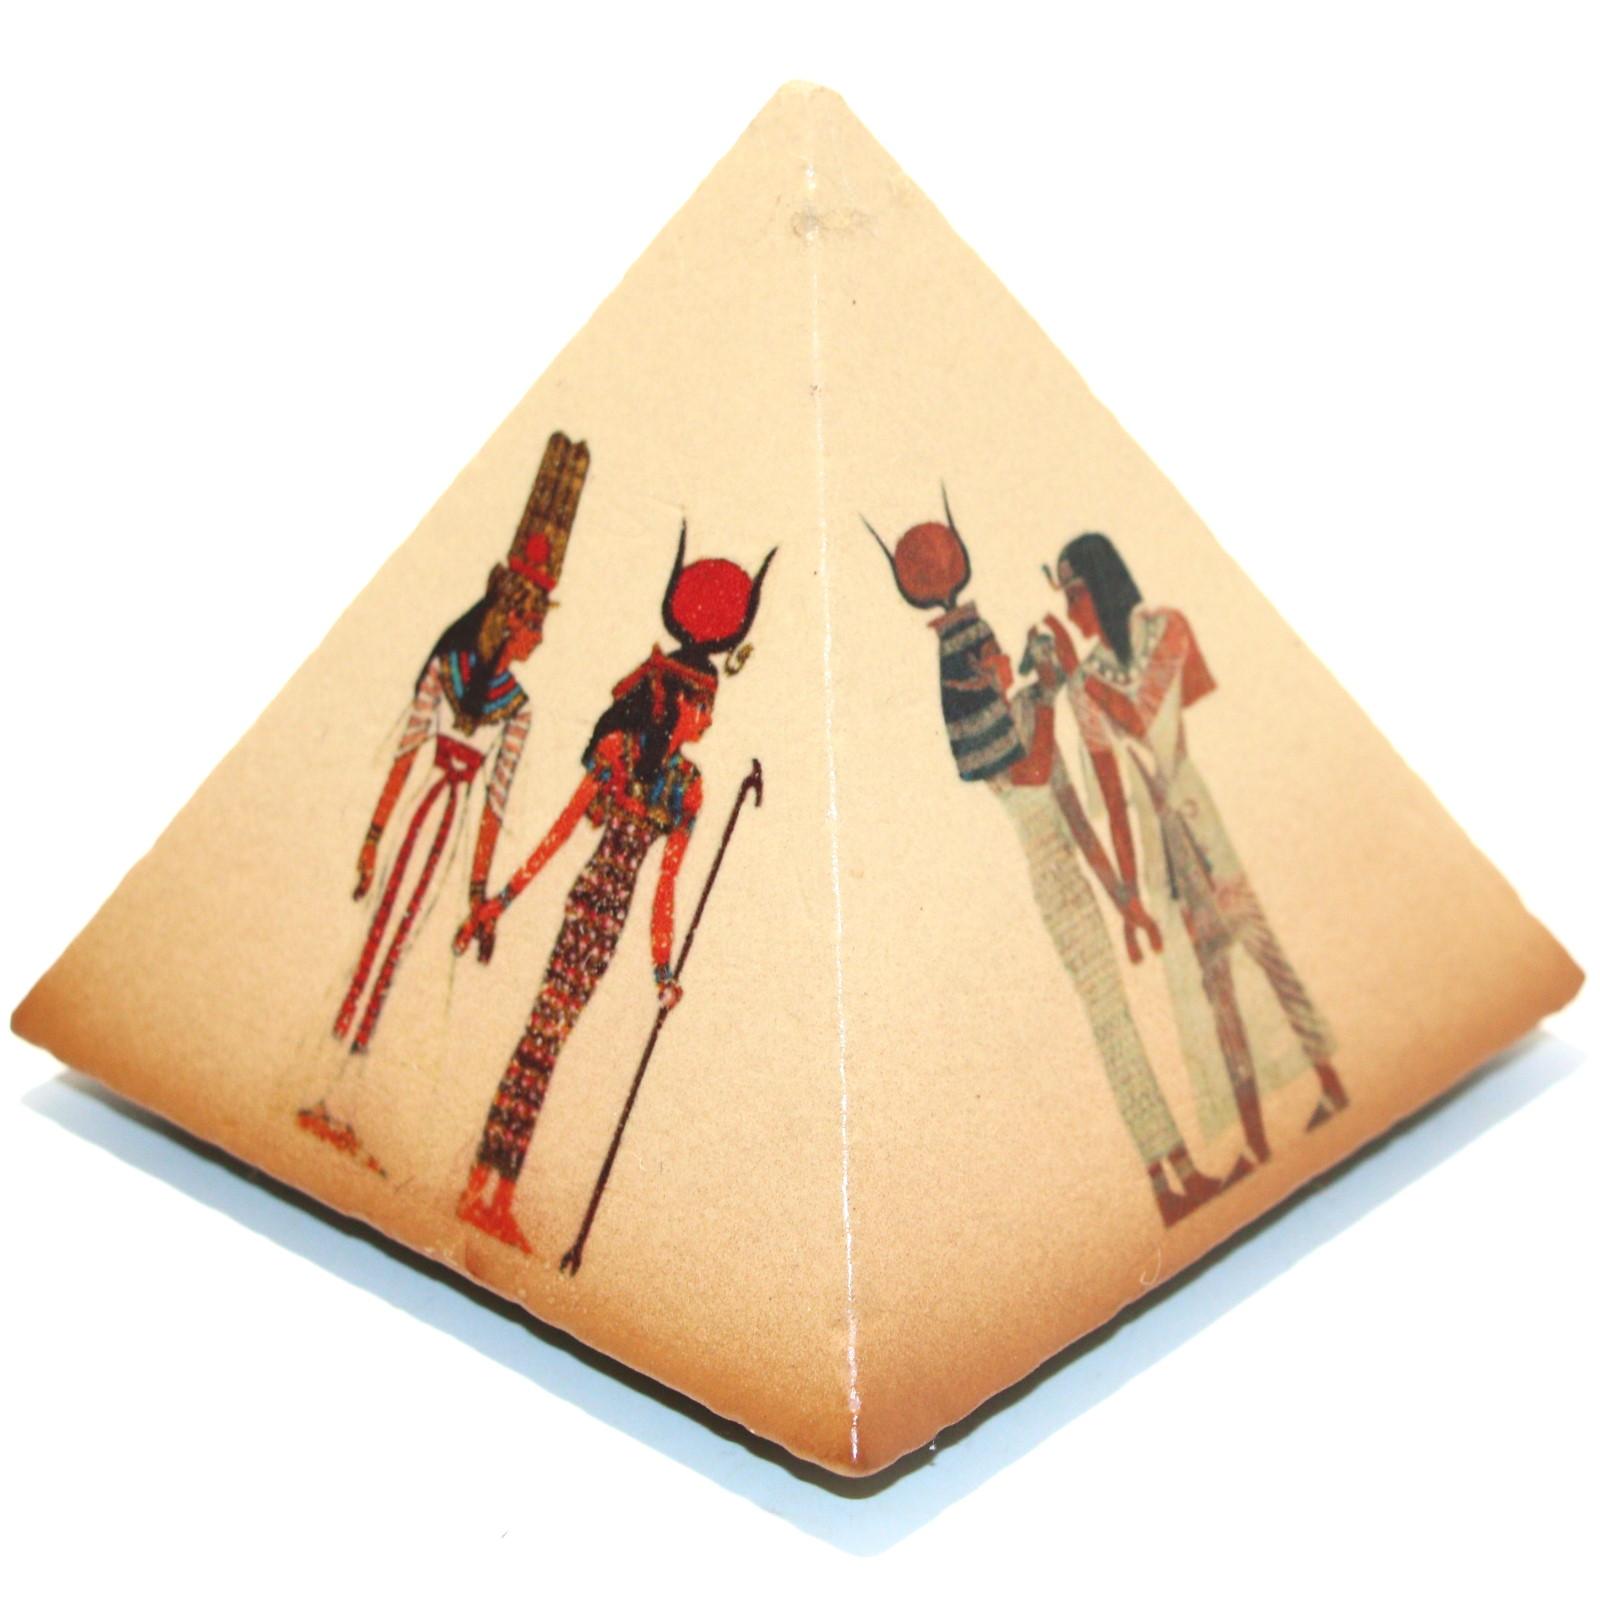 Pyramid  Sarcophagus Mysterium by Buma